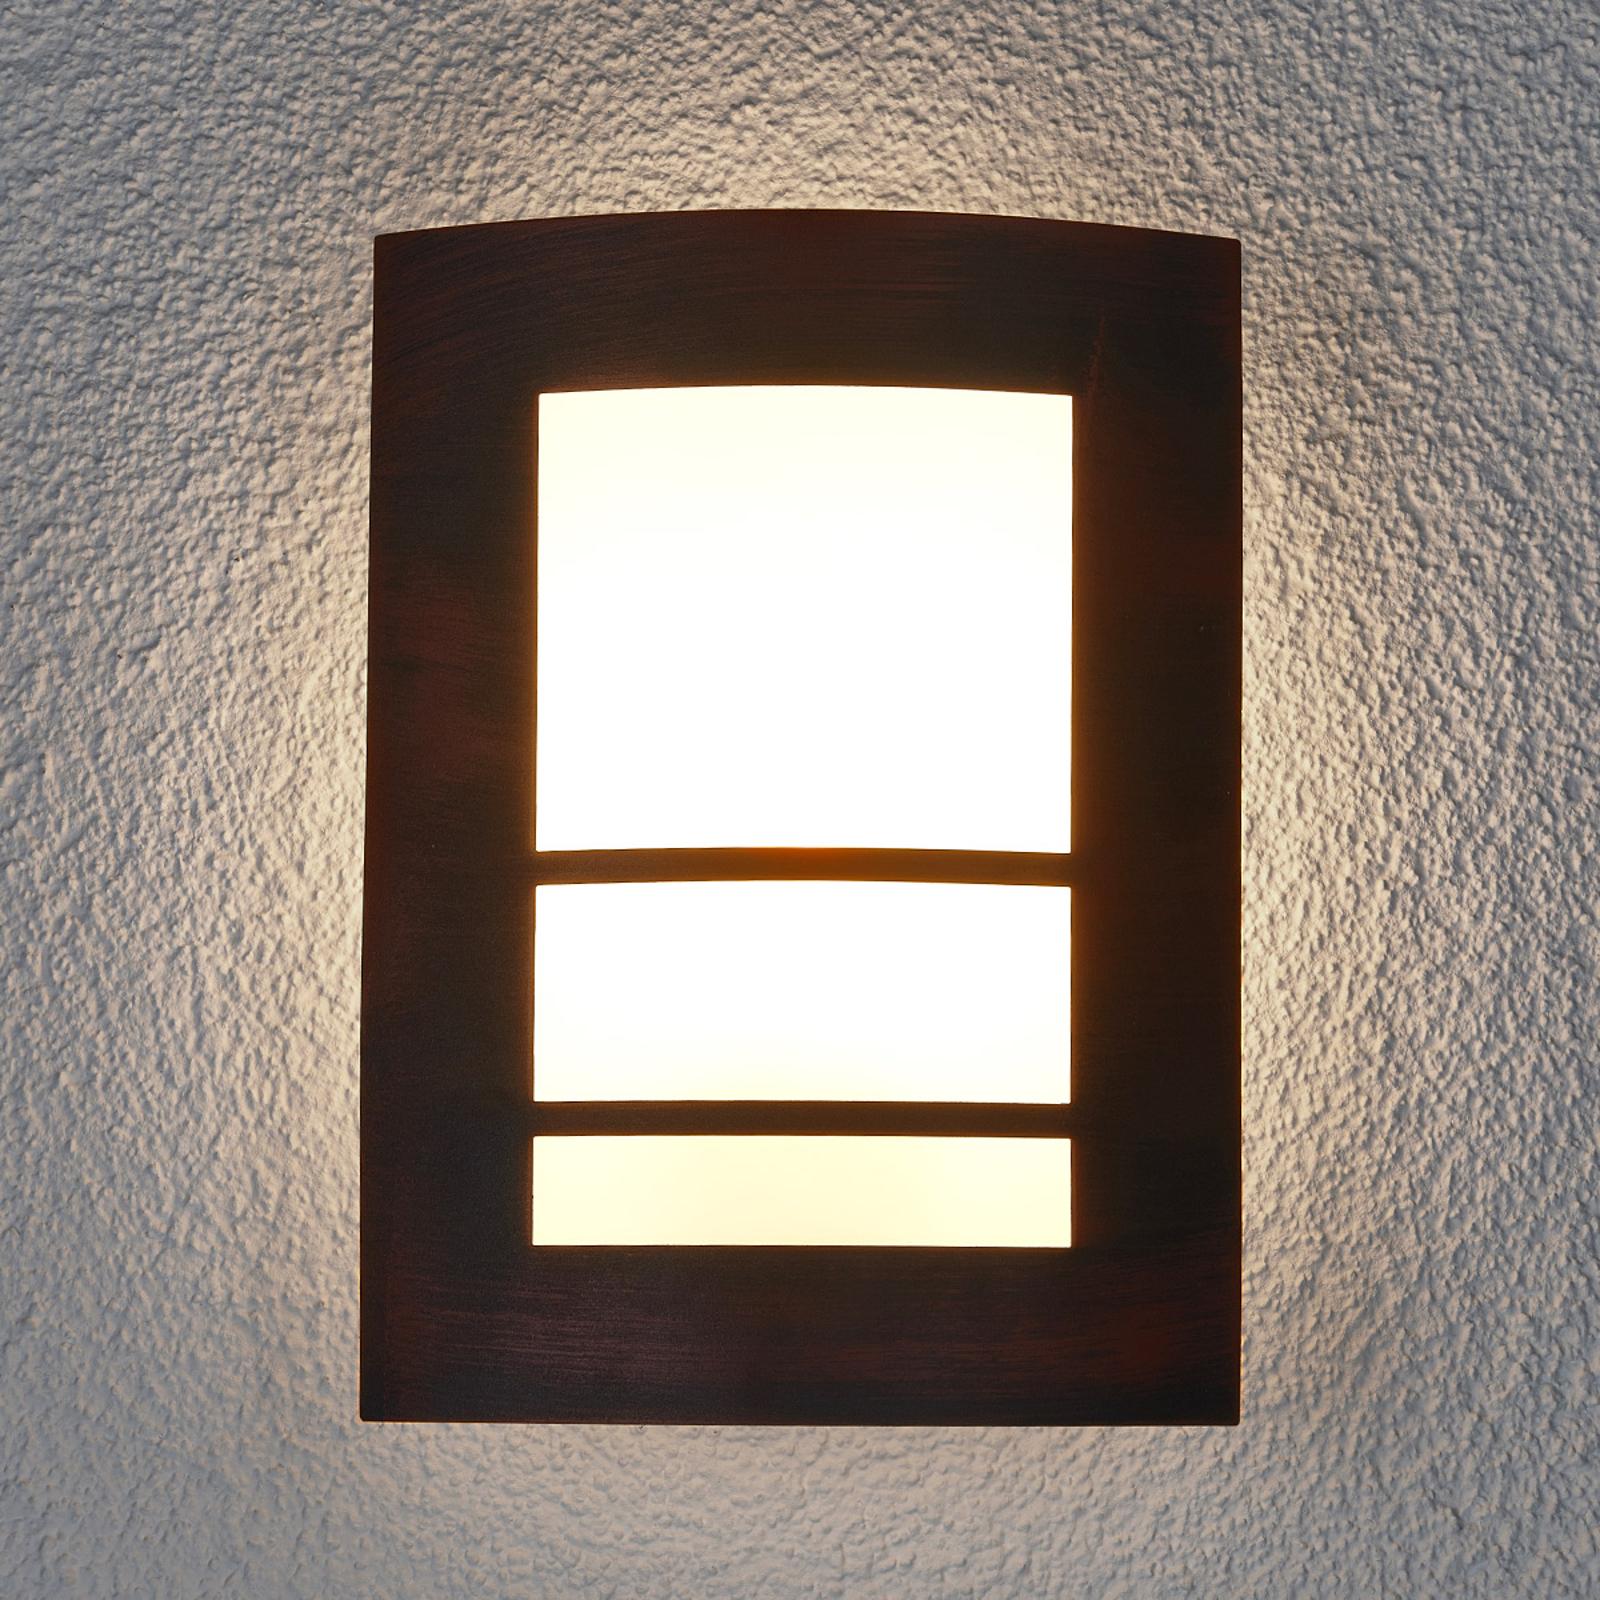 Lampada Katalea, ruggine, da parete, per esterni